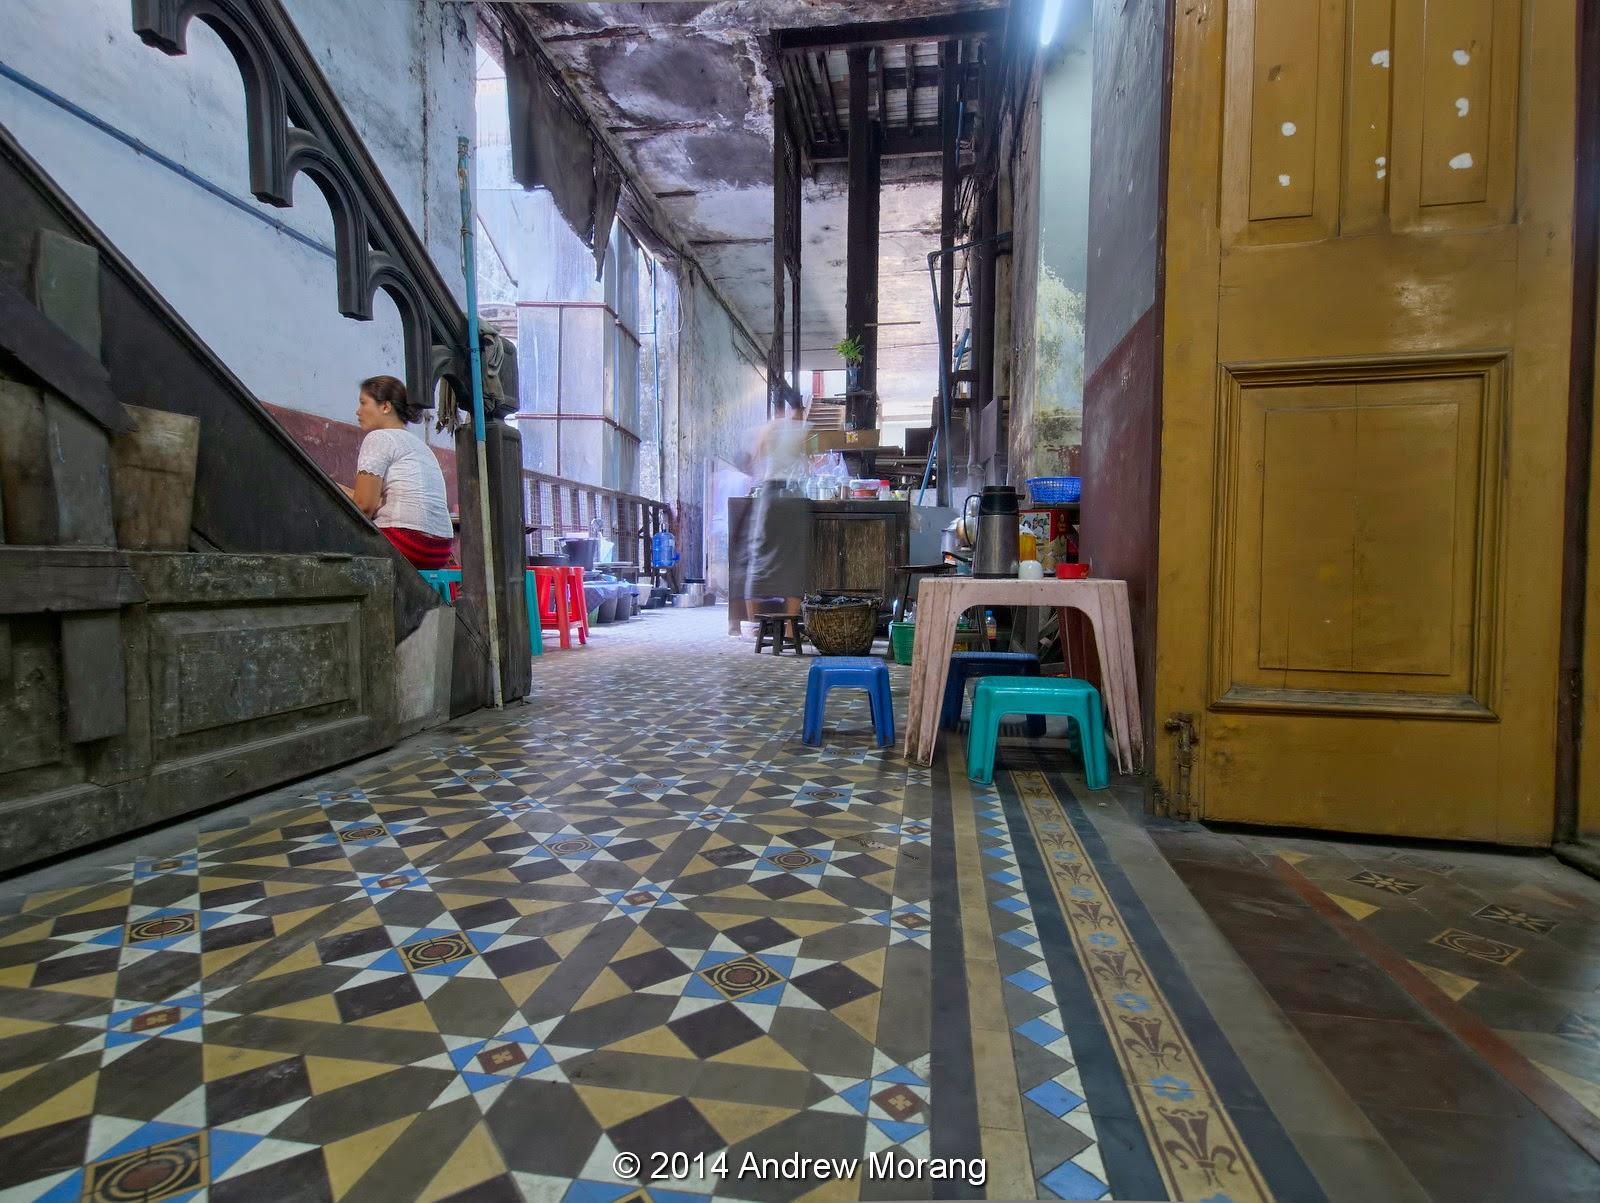 sofaer co building yangon get rid of old sofa sofology urban decay burmese days 7 the rangoon heritage tour